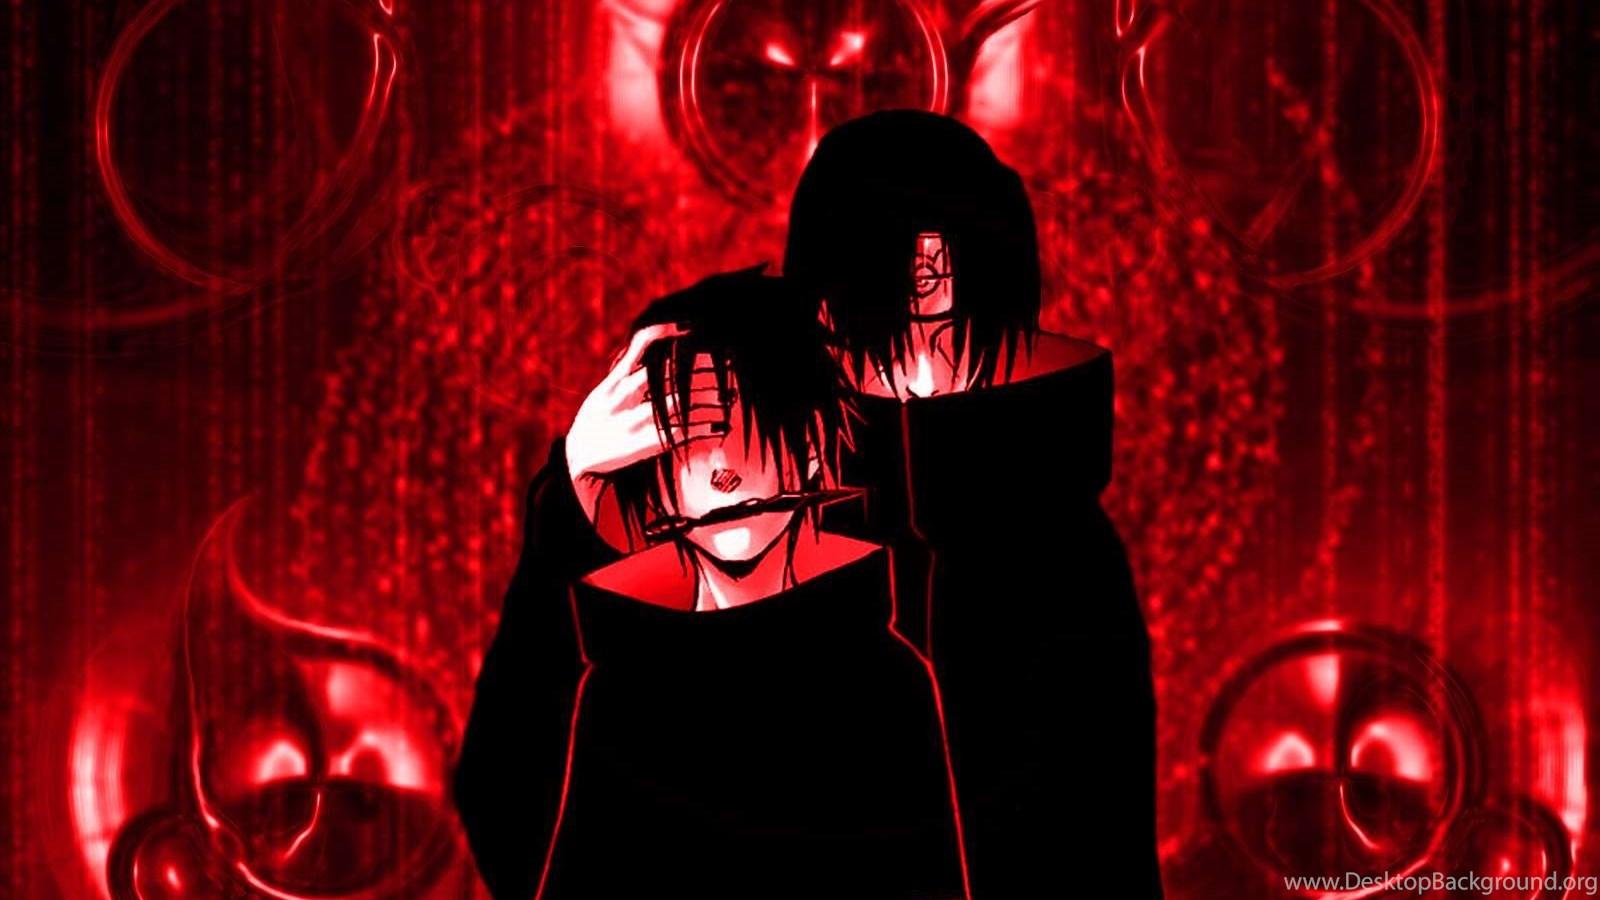 Download 72 Wallpaper 3d Naruto Hd HD Paling Keren